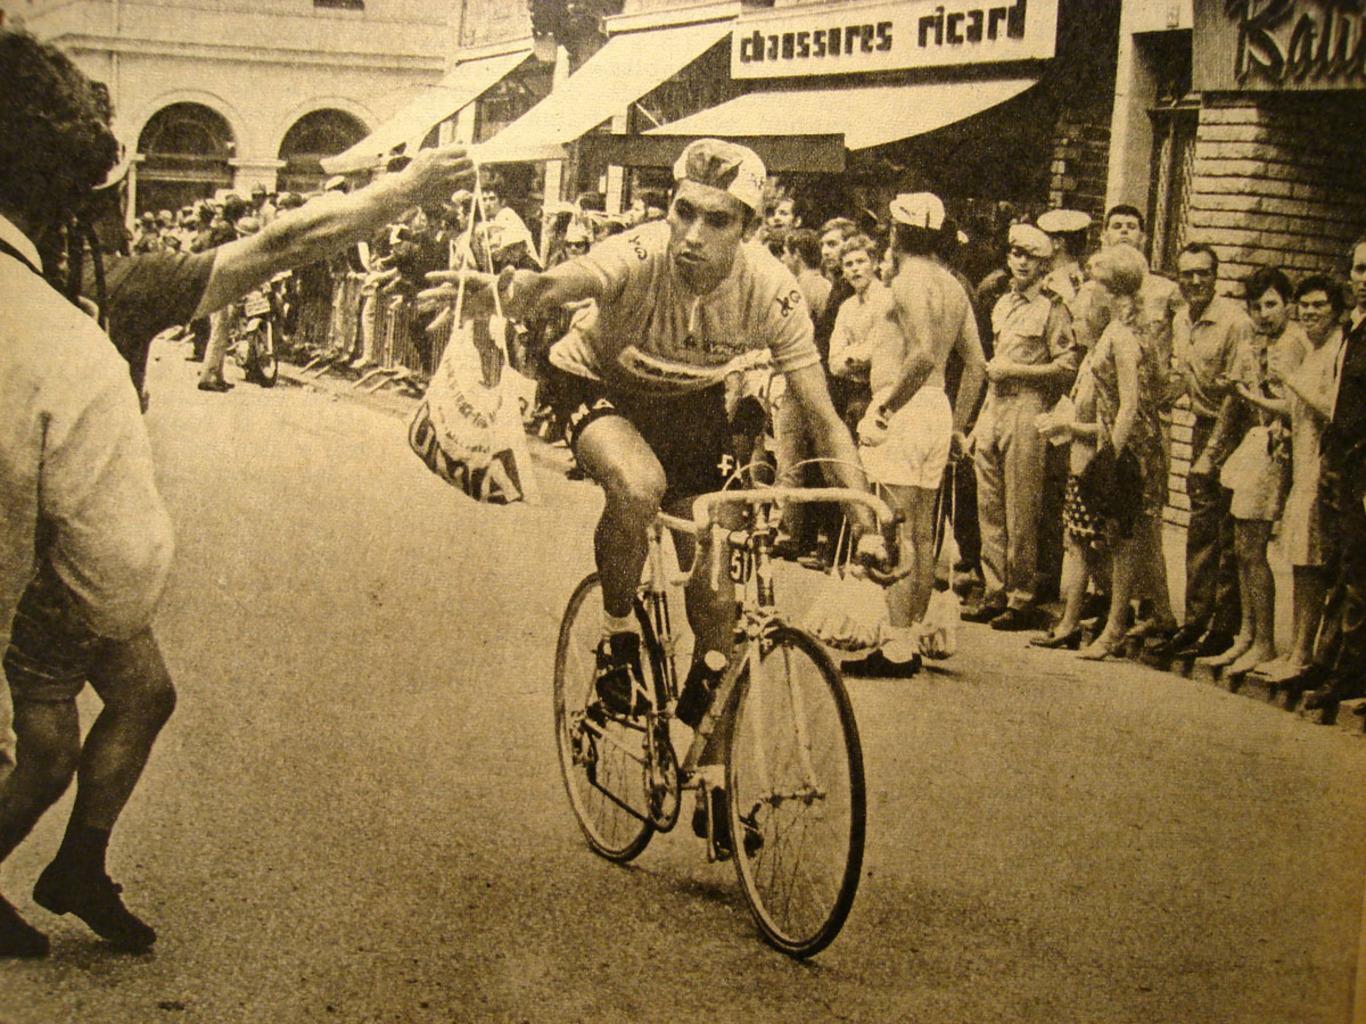 Eddy Merckx grabbing a musette